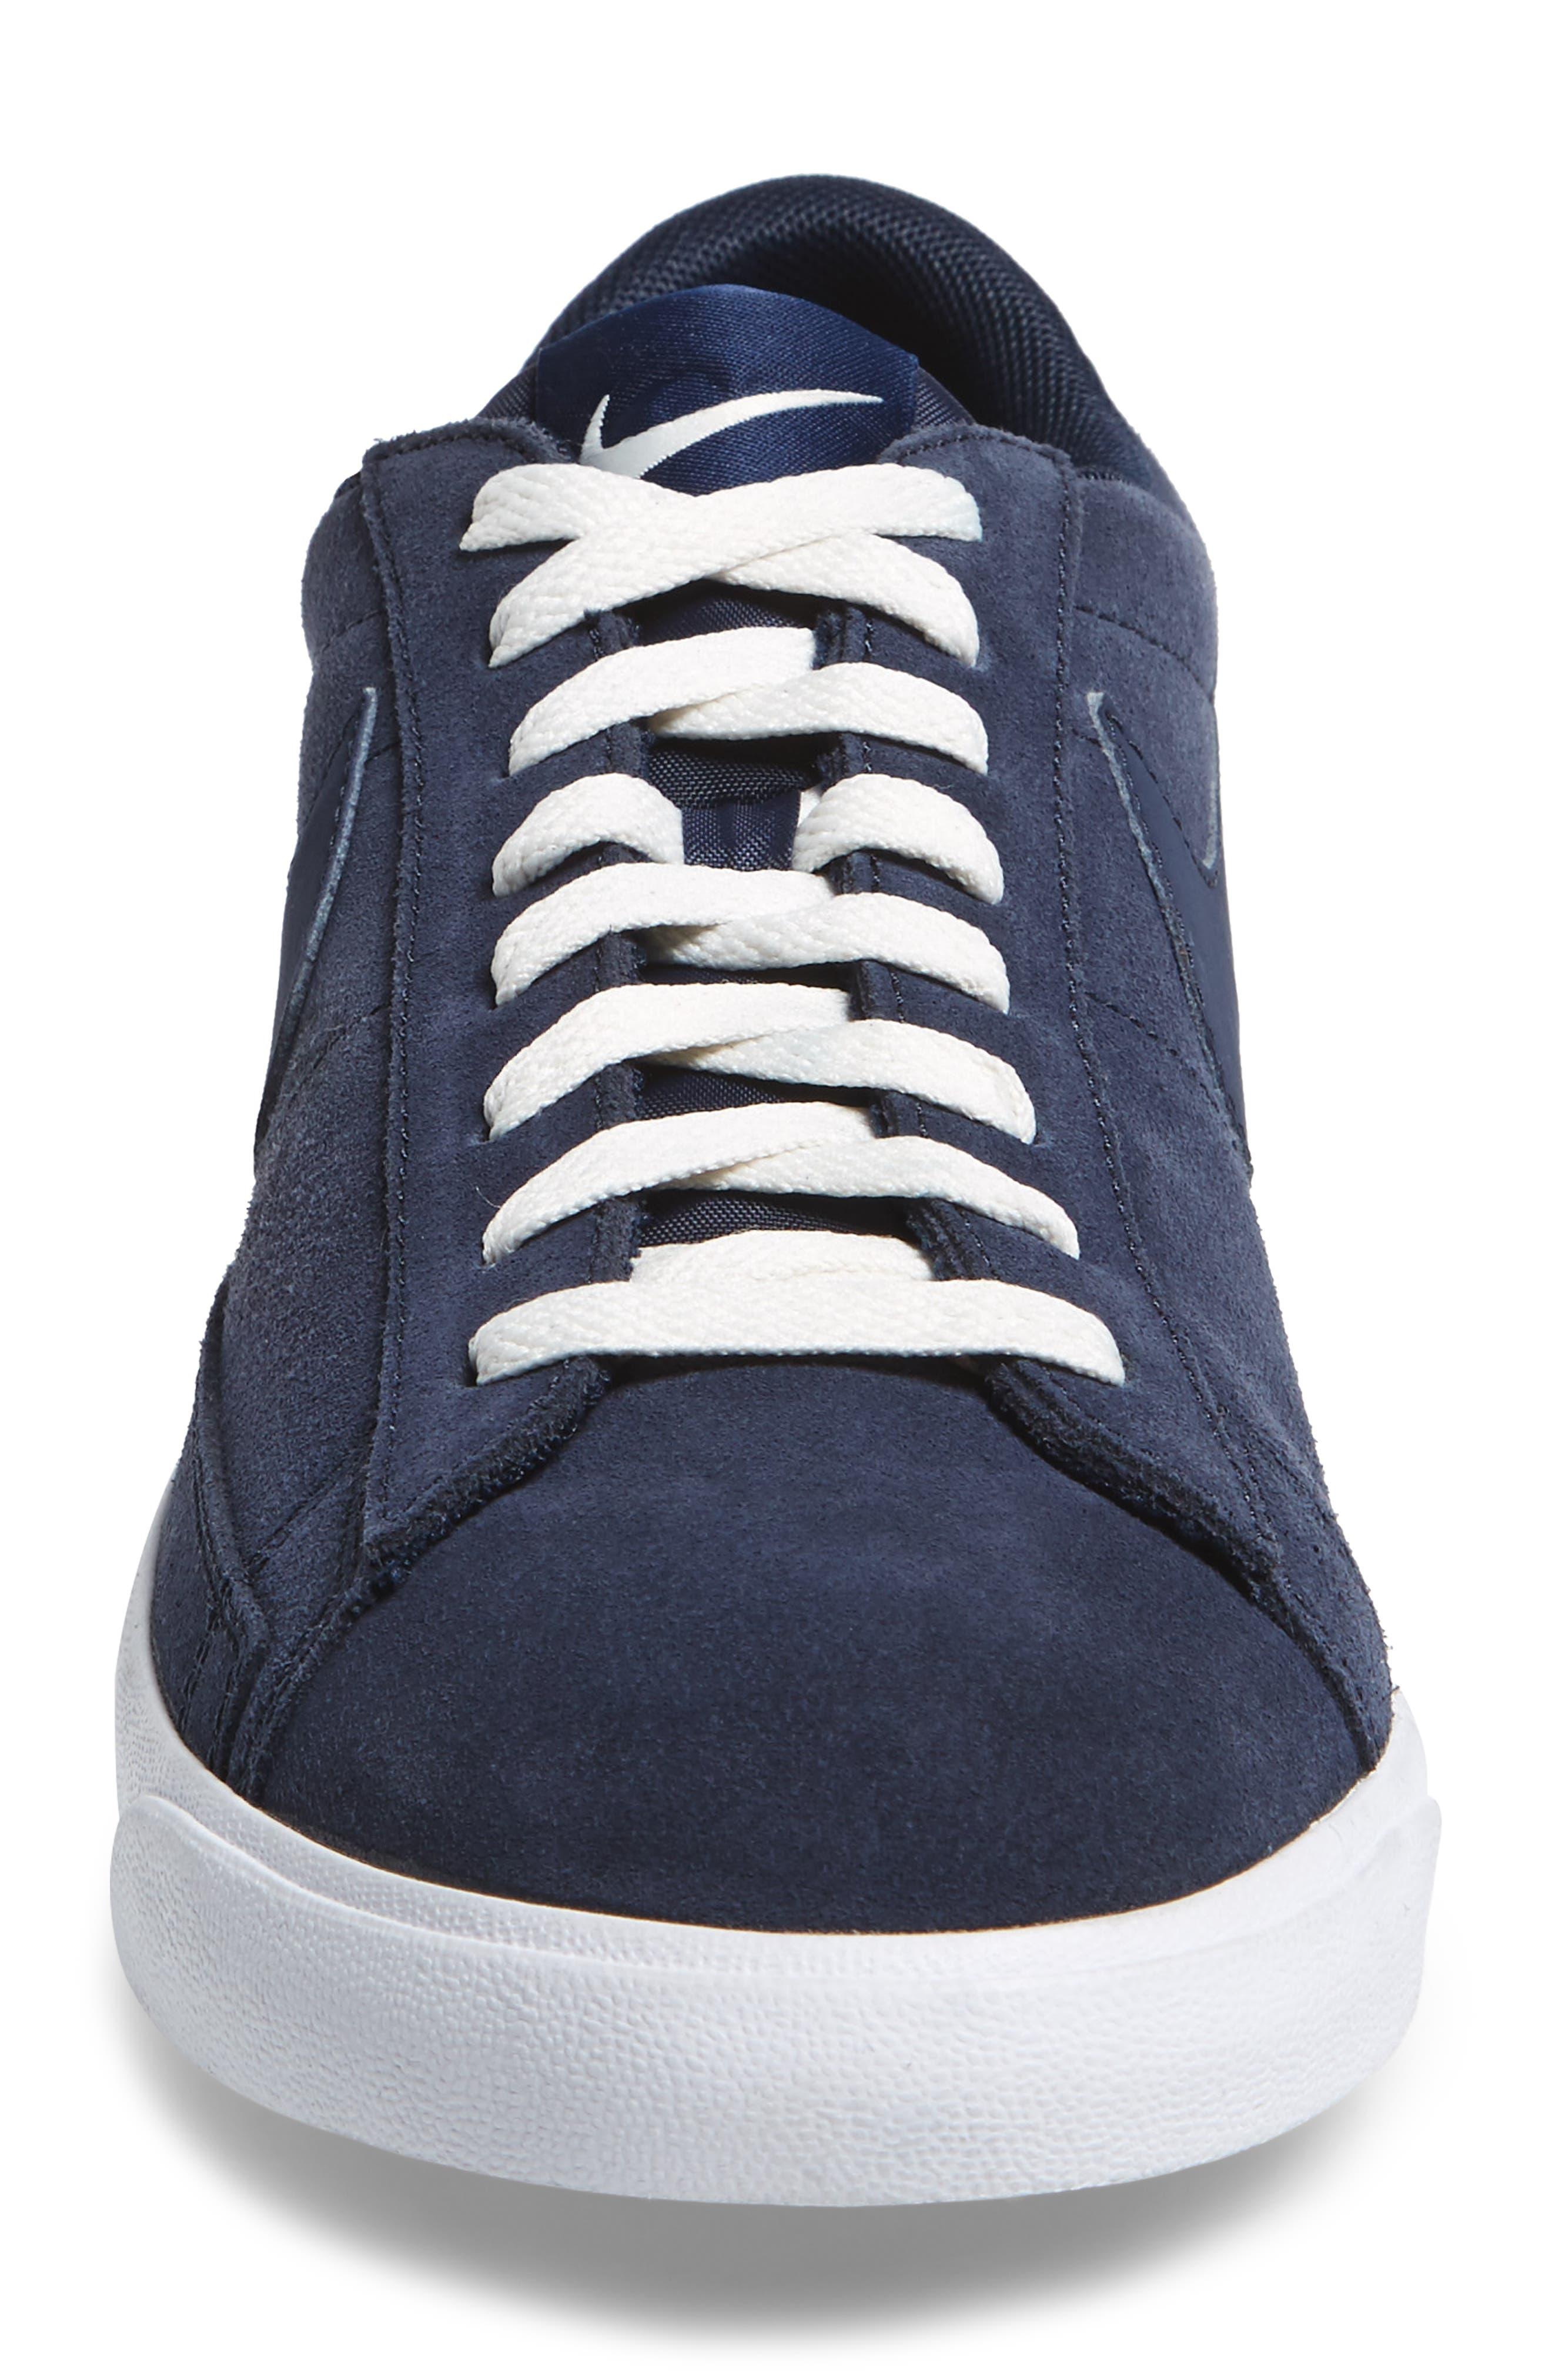 Blazer Low Suede Sneaker,                             Alternate thumbnail 4, color,                             Obsidian/ Sail/ Brown